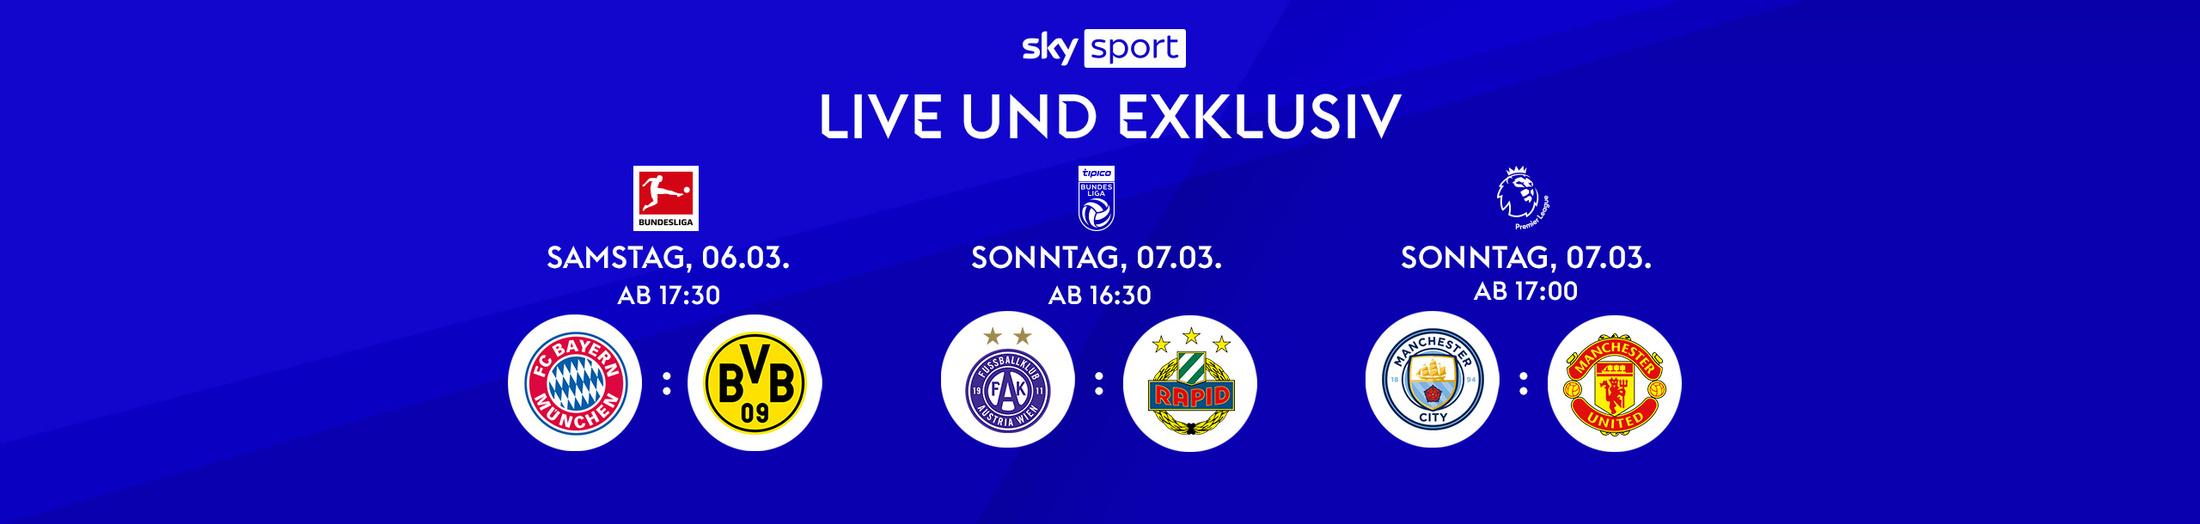 Sky X UEFA Champions League